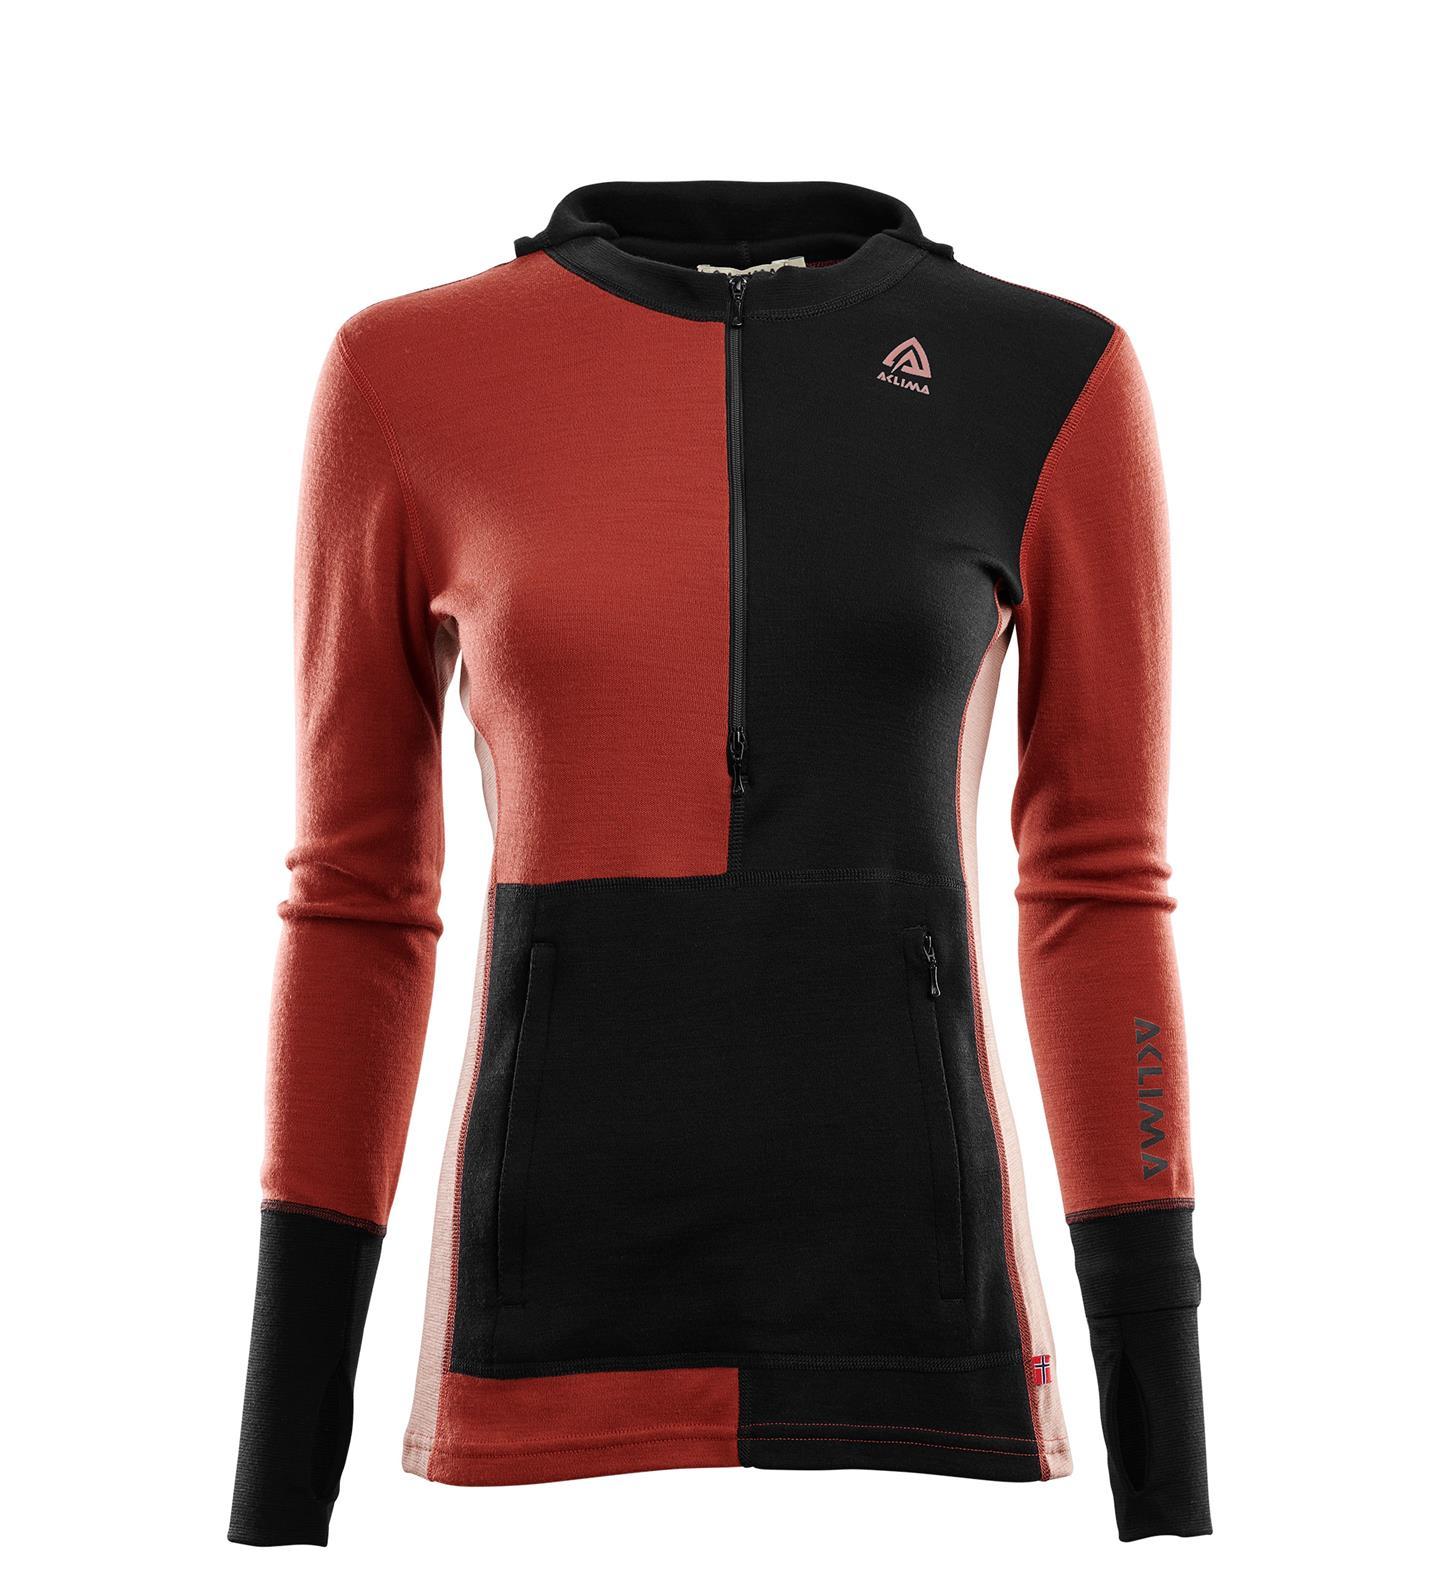 Aclima Warmwool Hooded Sweater w/zip Dam Jet Black / Red Ochre / Cognac - UTFÖRSÄLJNING